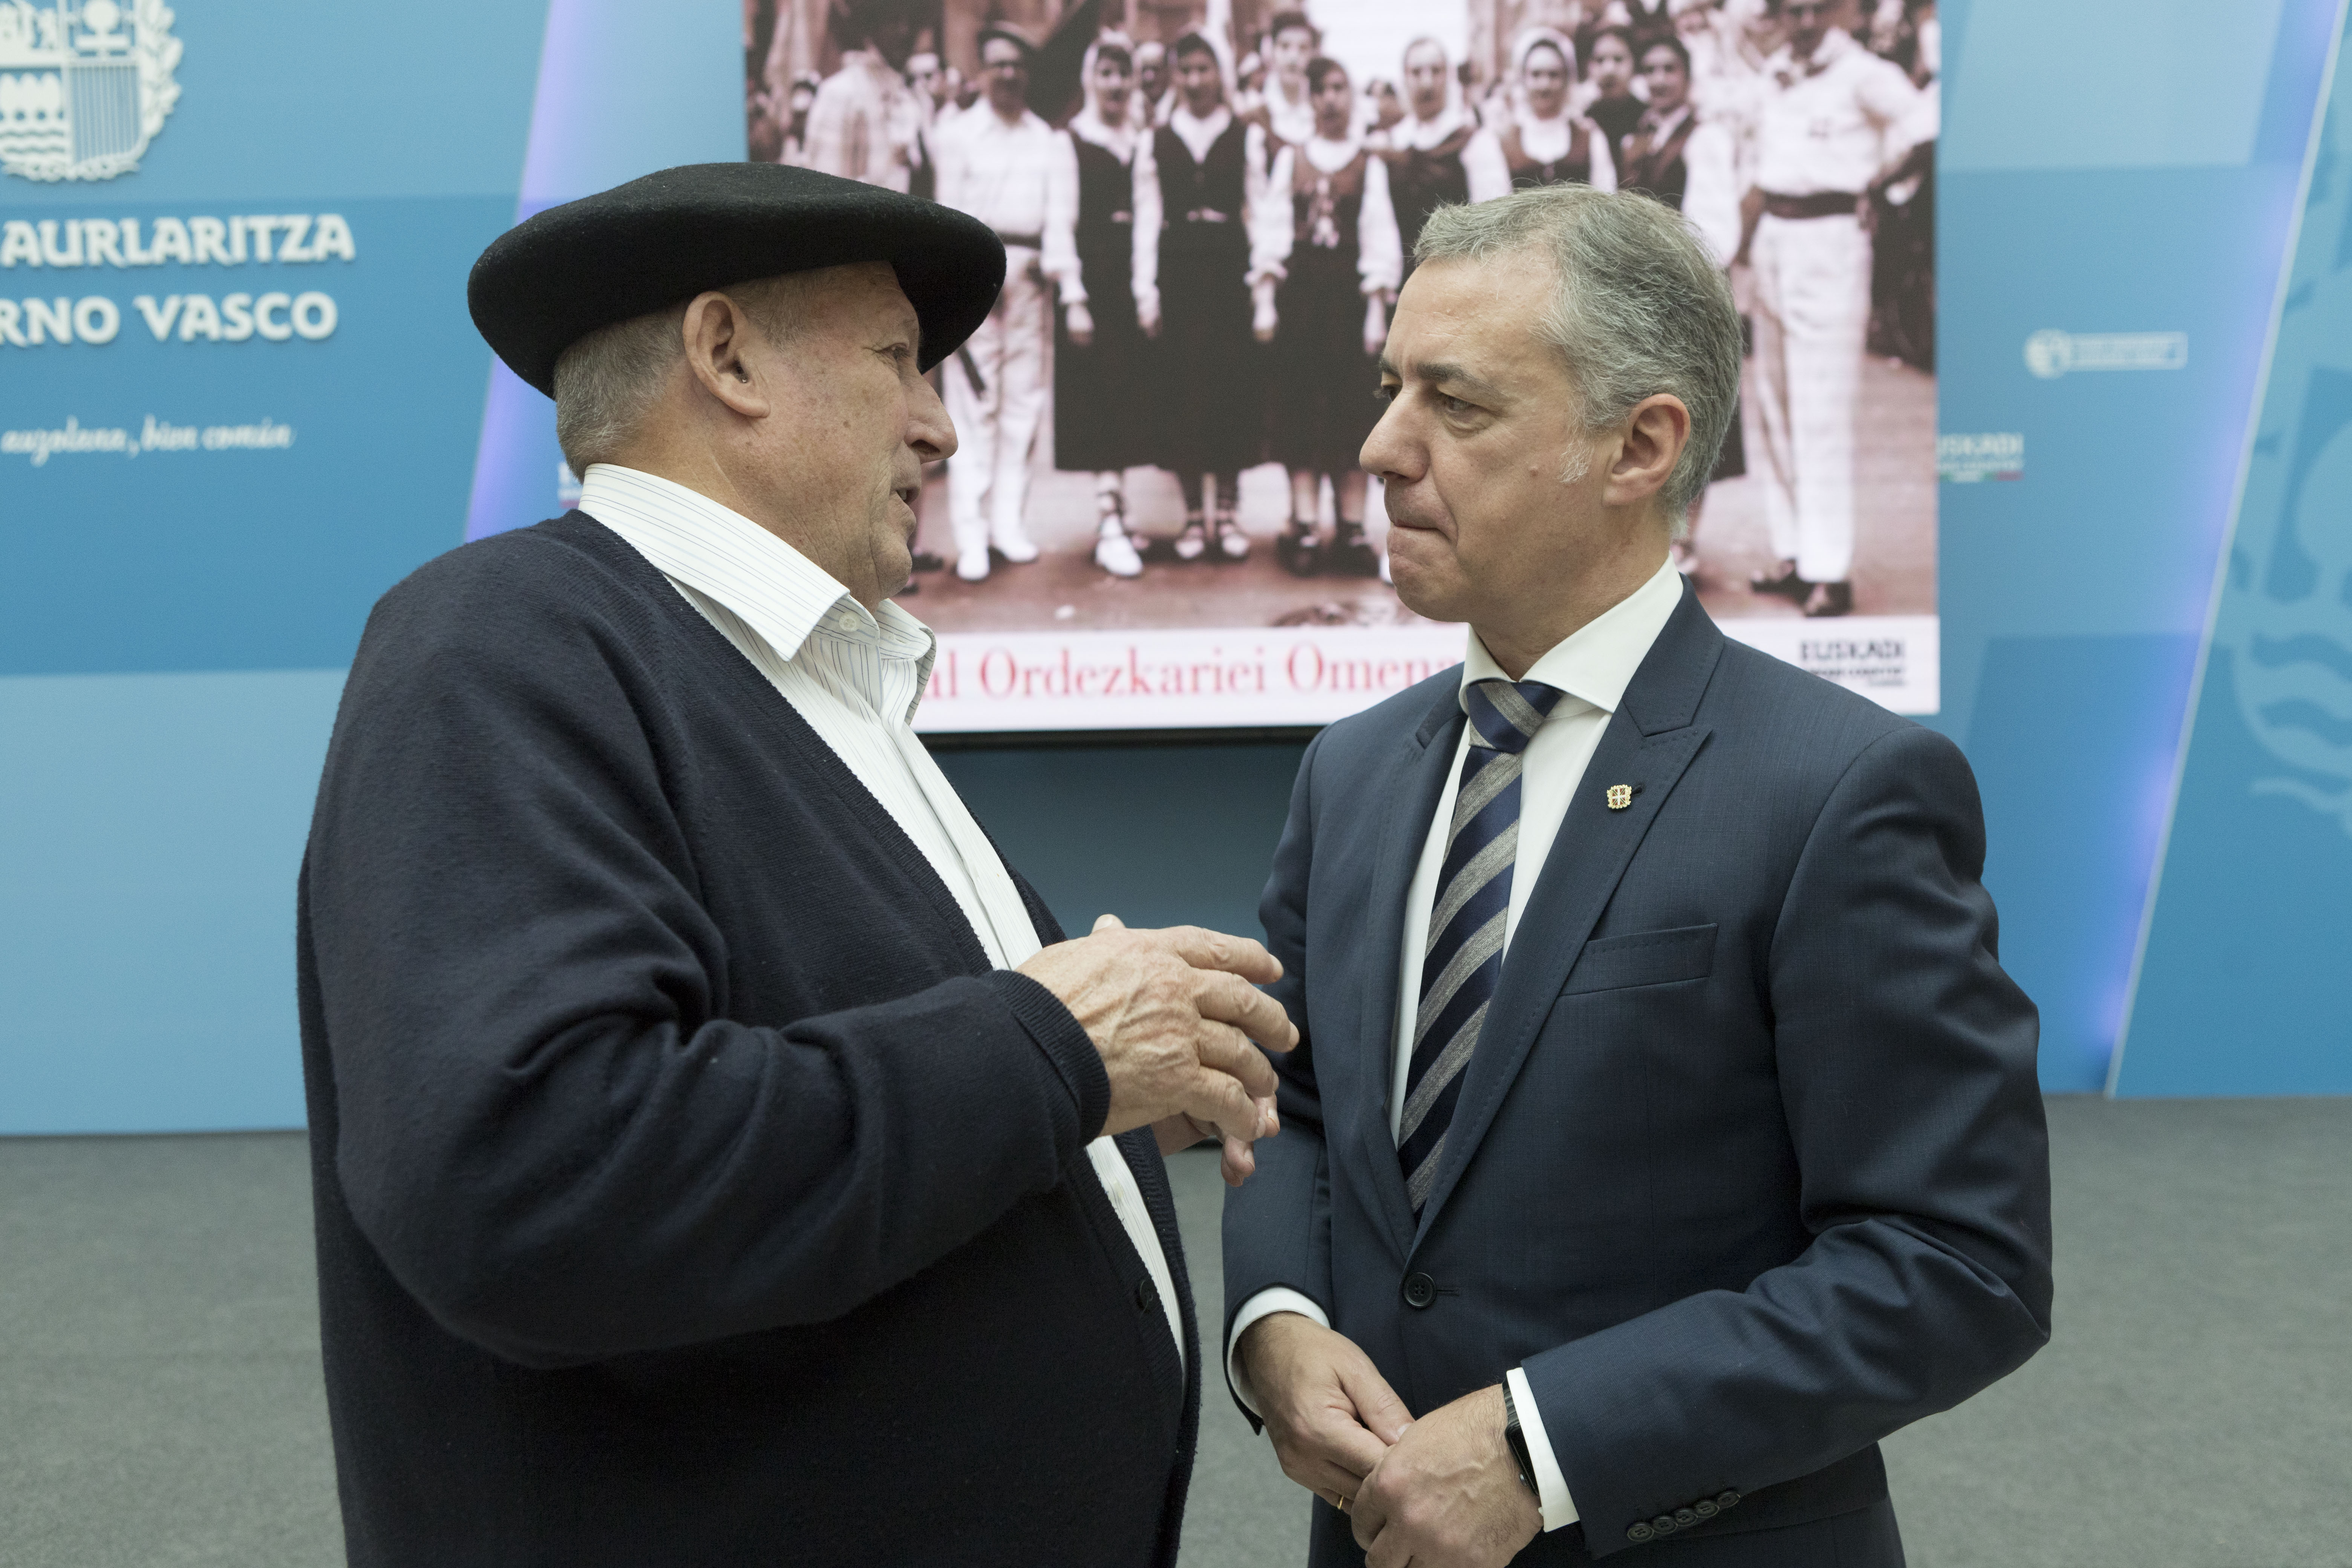 20181130_lhk_delegaciones_143.jpg